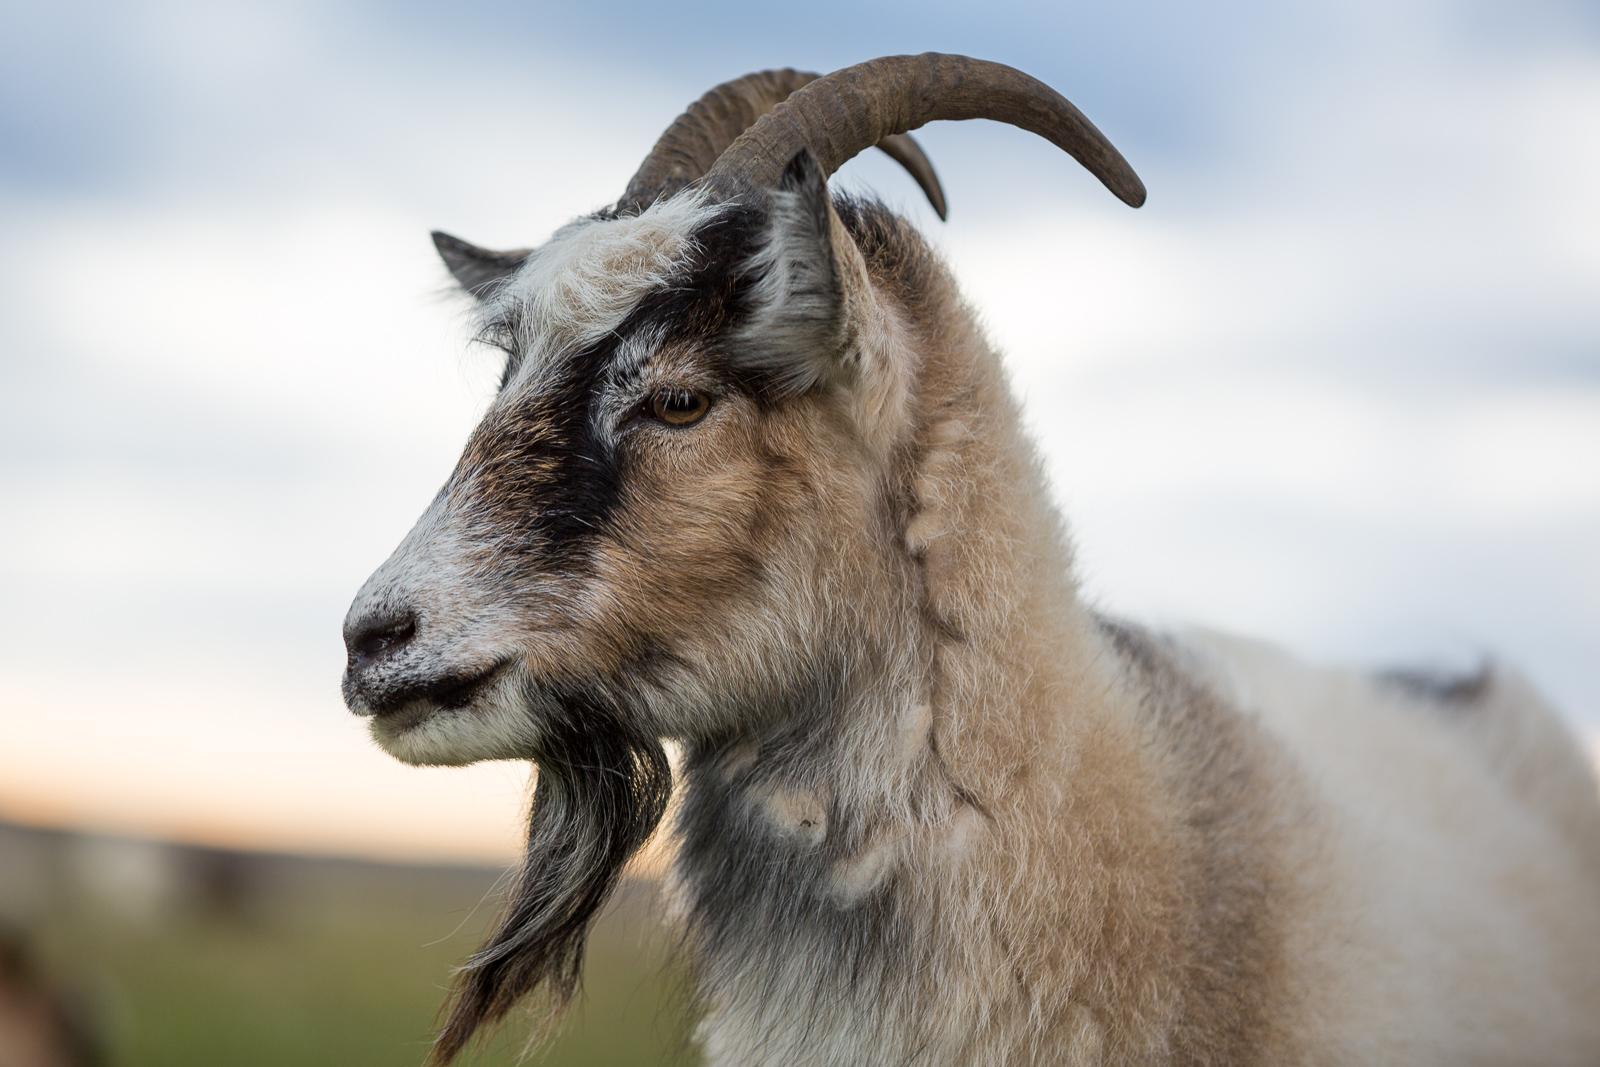 goat - photo #23